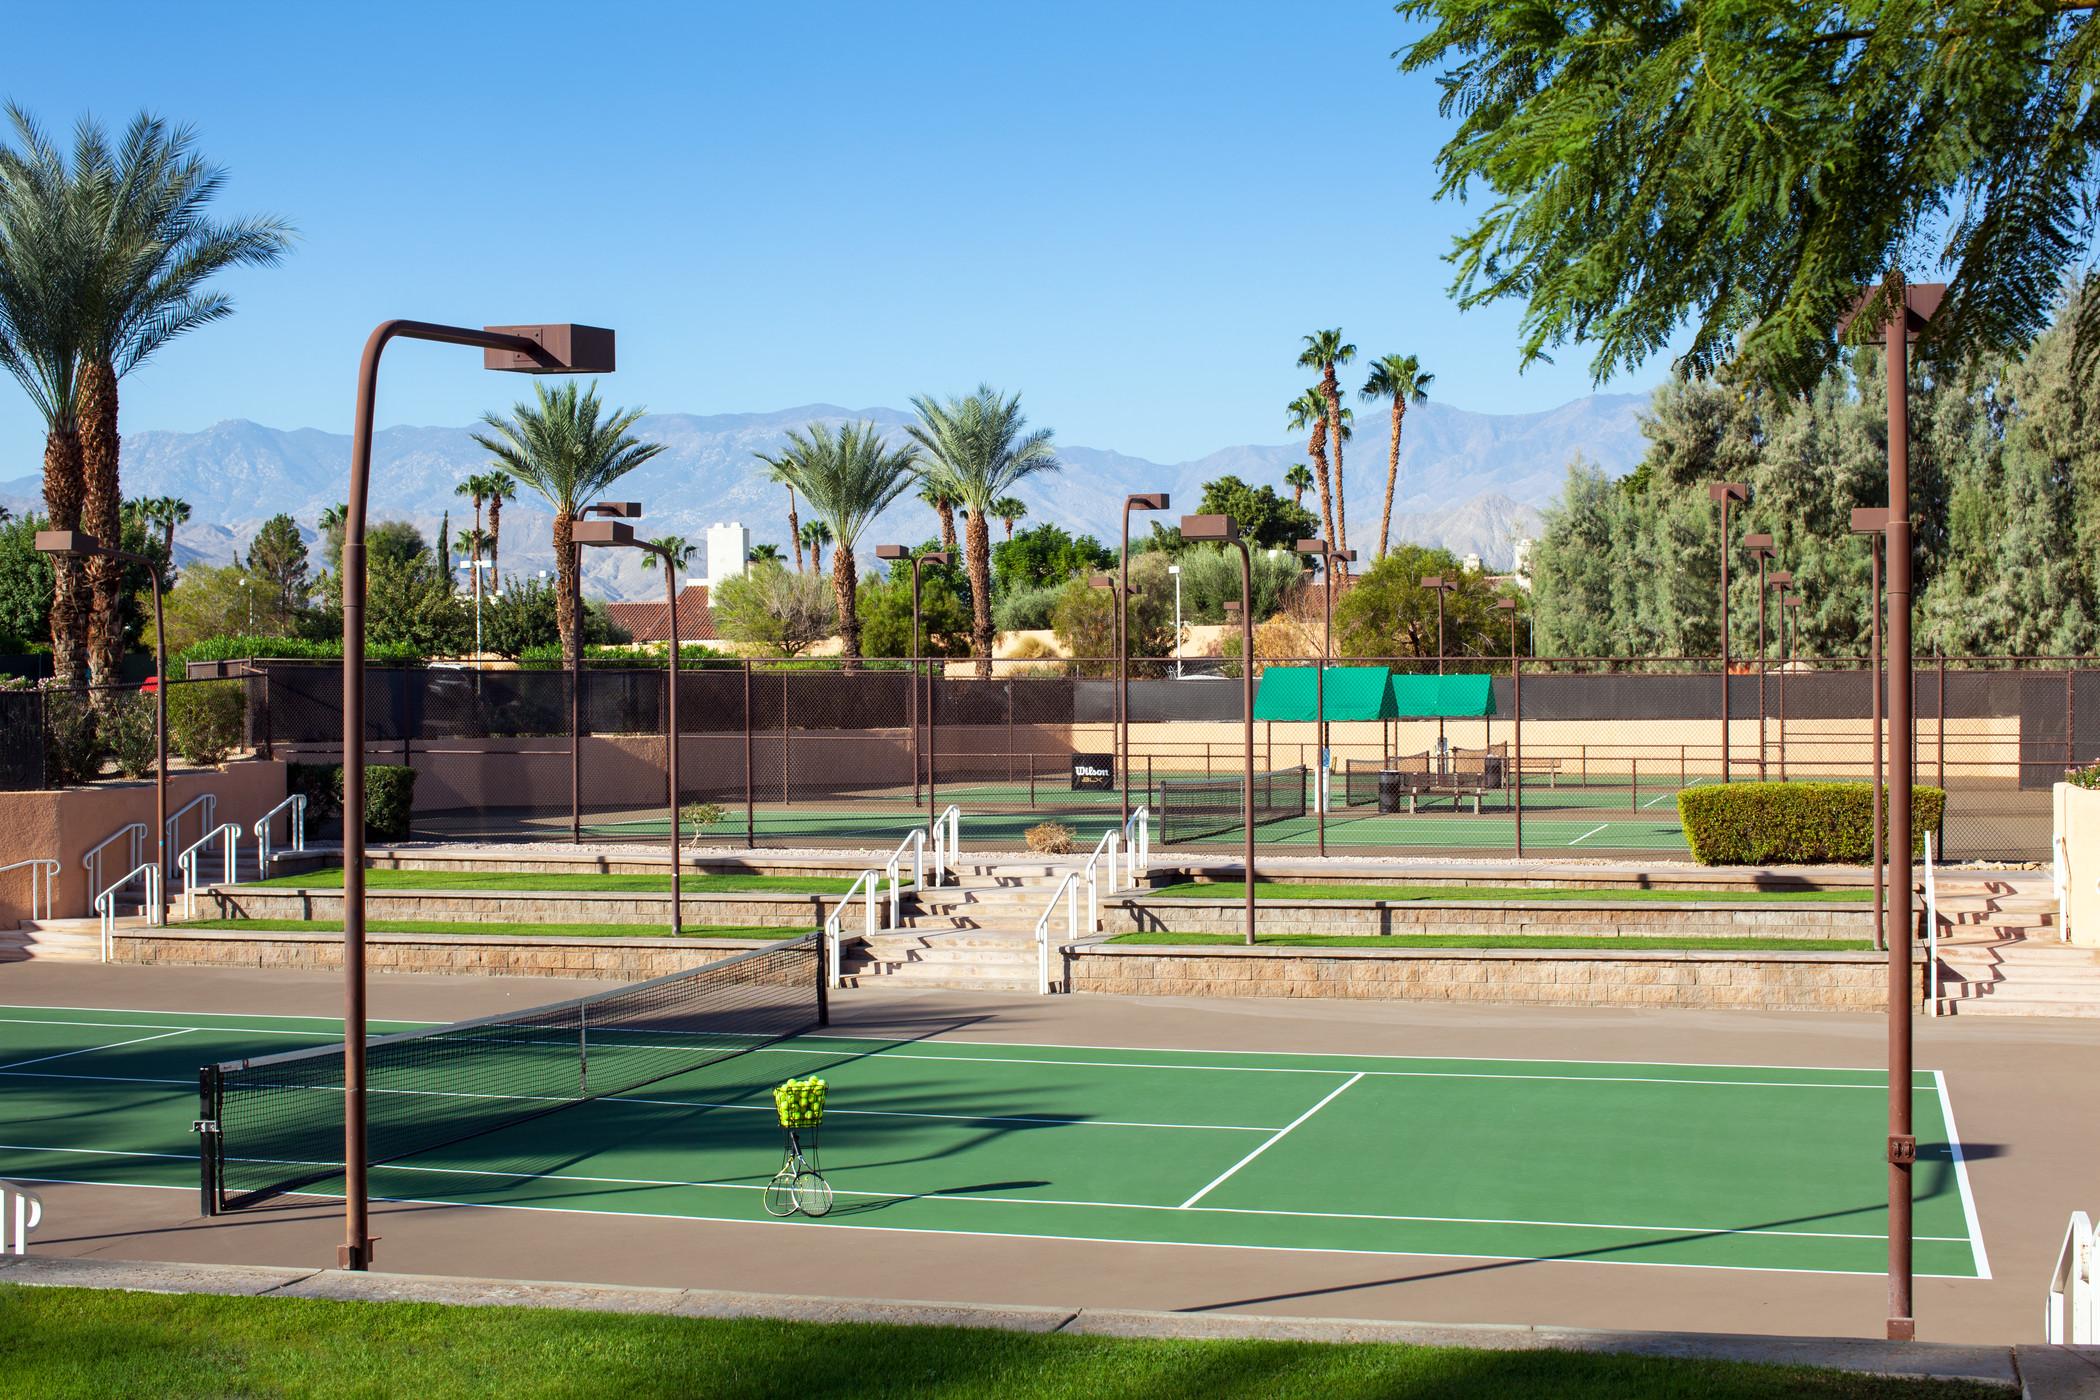 wes1008ag-178201-tennis courts-Med.jpg